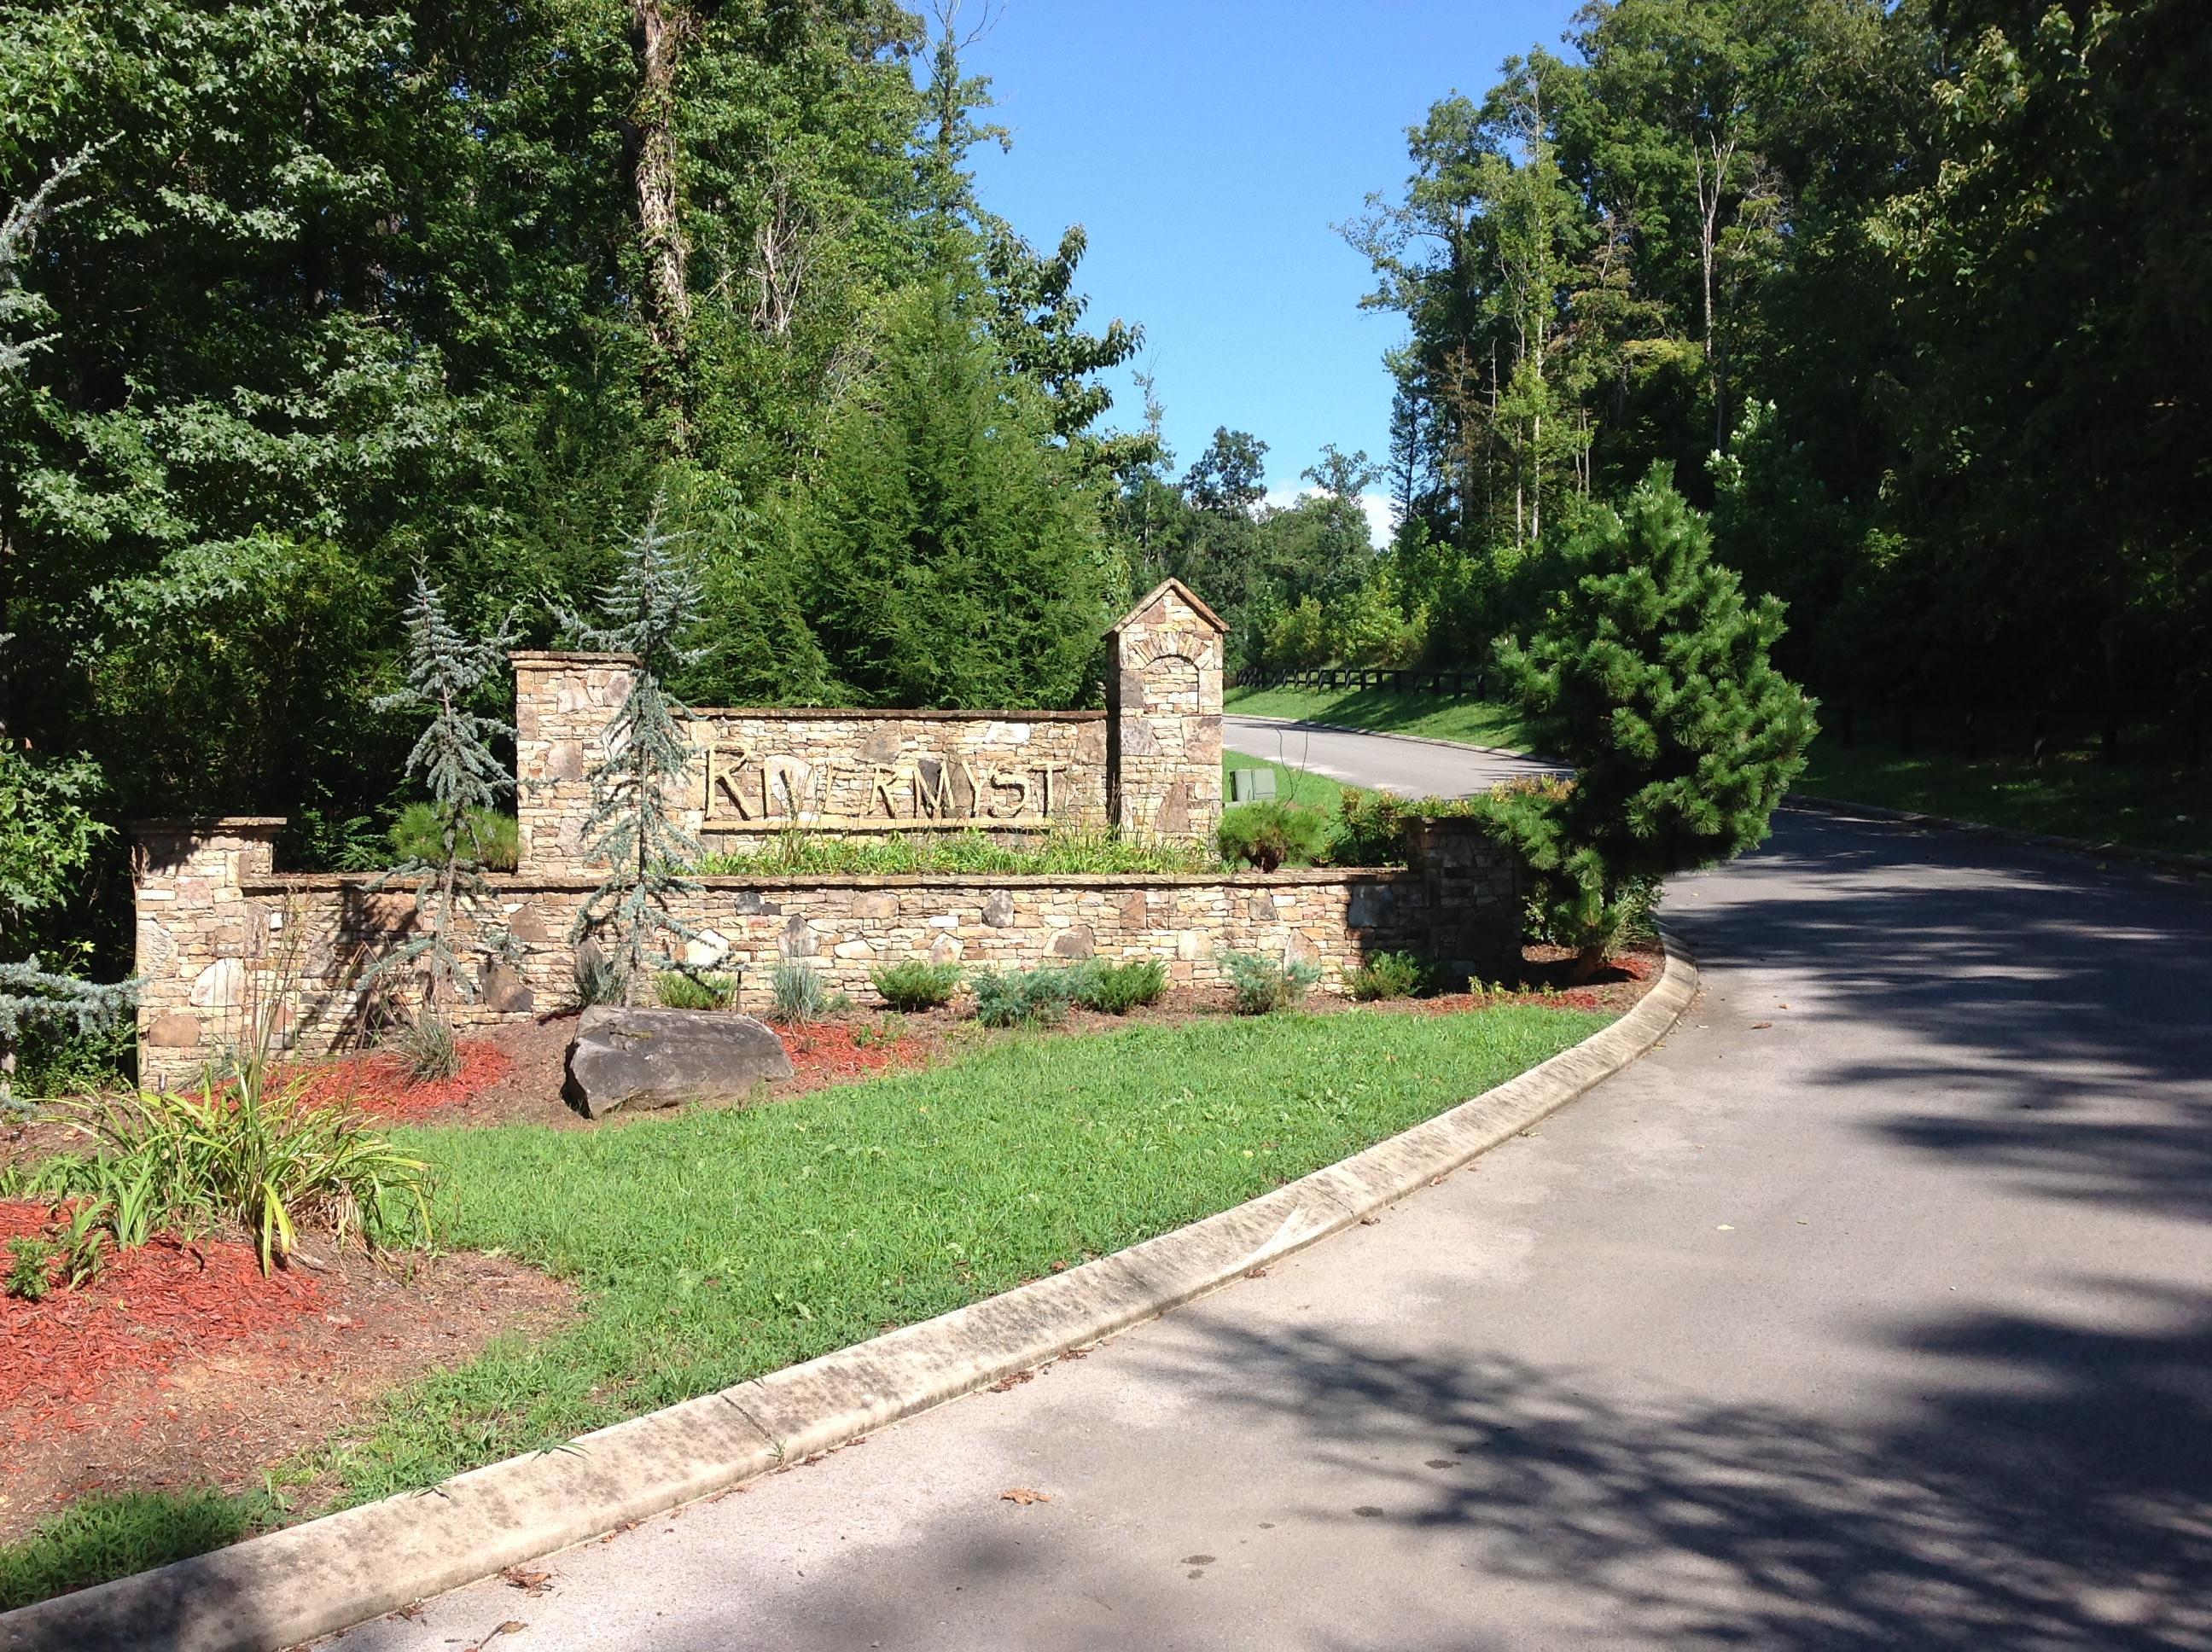 0 Rivermyst Dr, Spring City, TN 37381